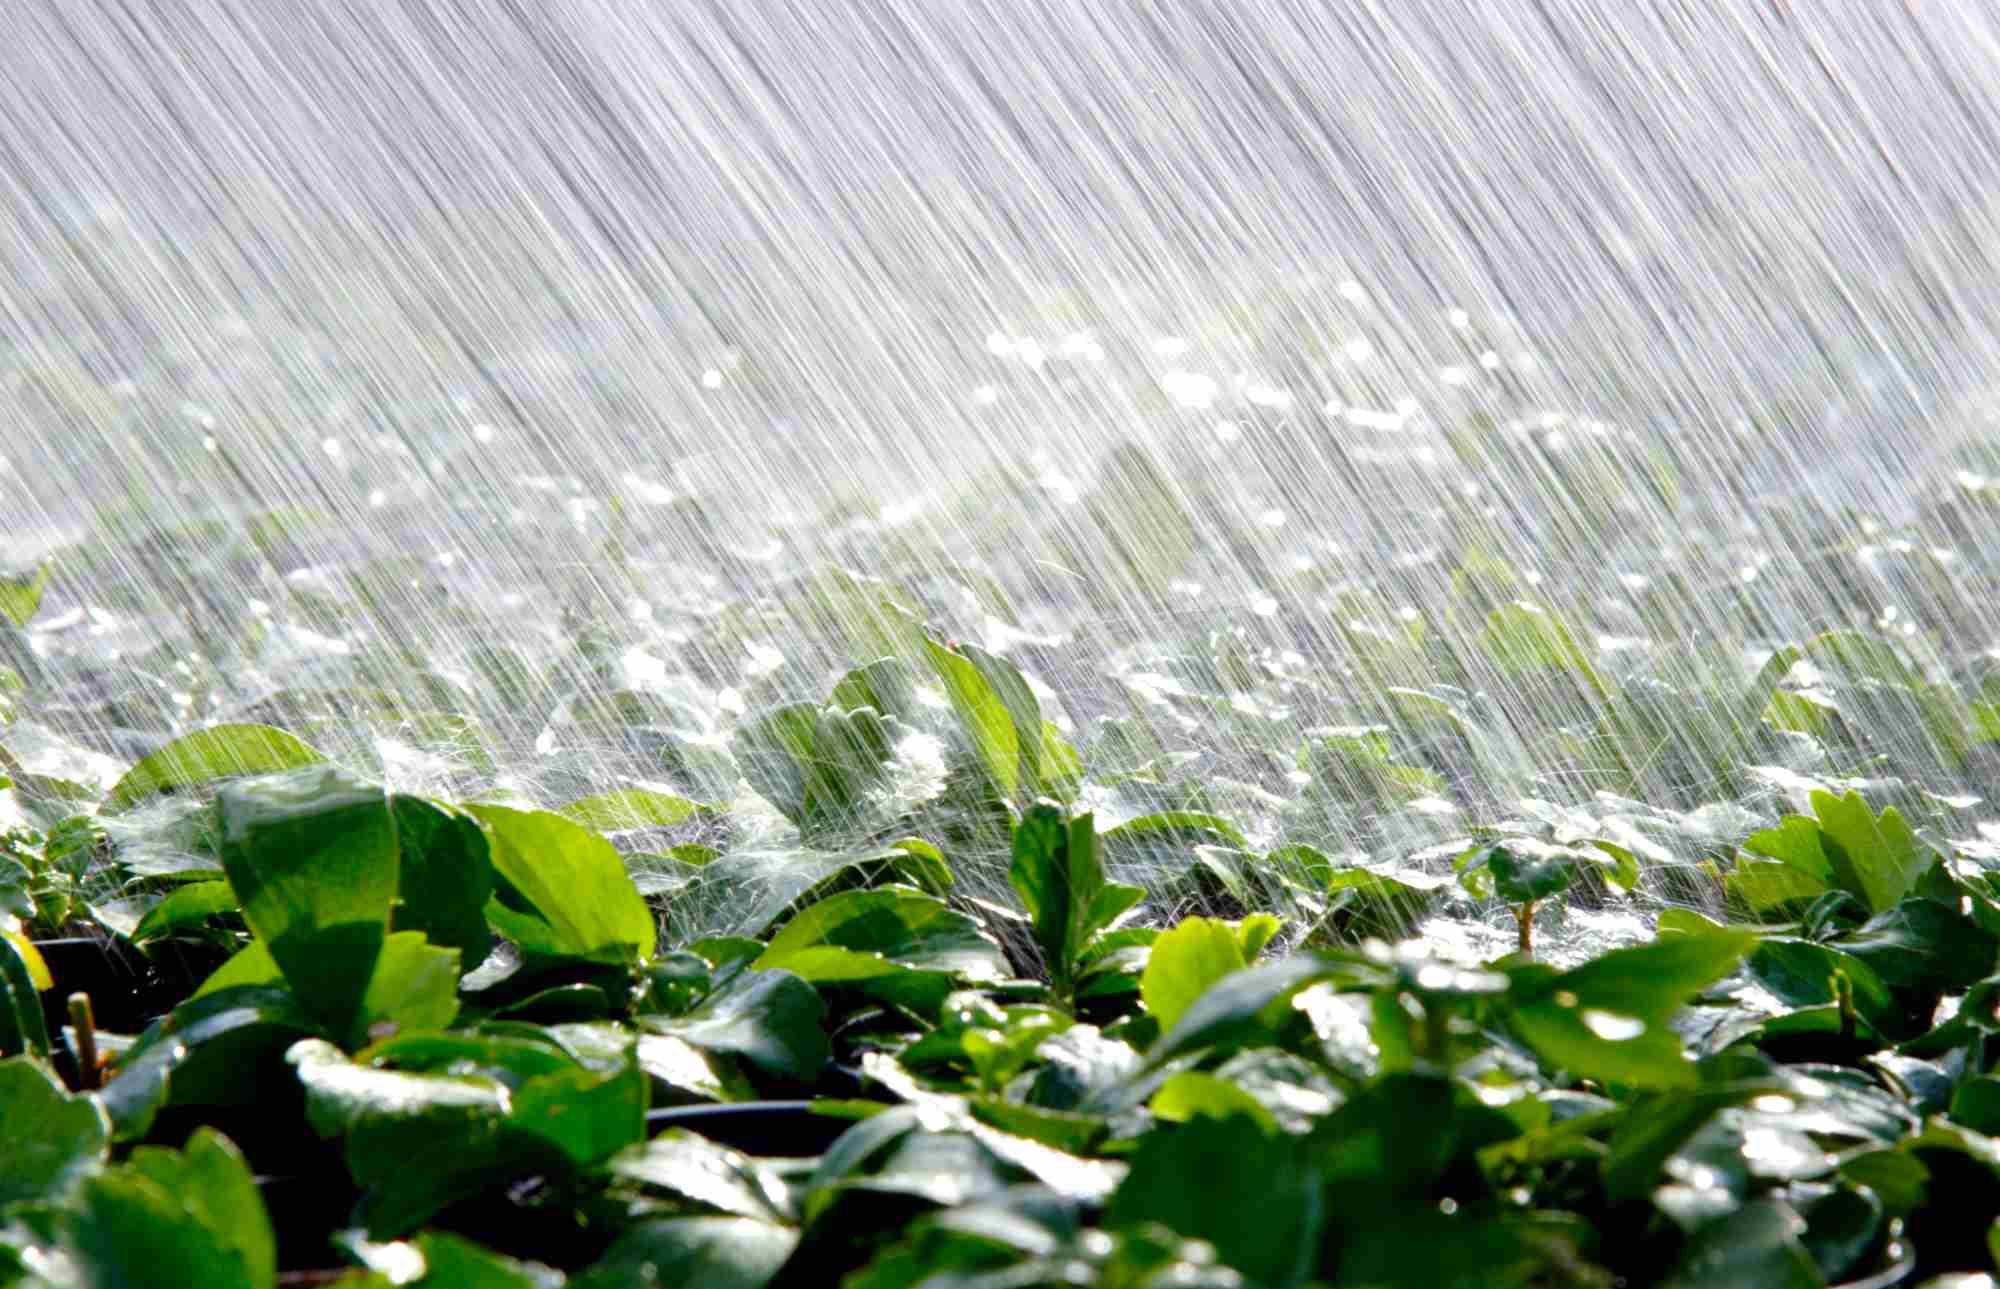 Partial heavy sprinkler rain on a field of pachysandra